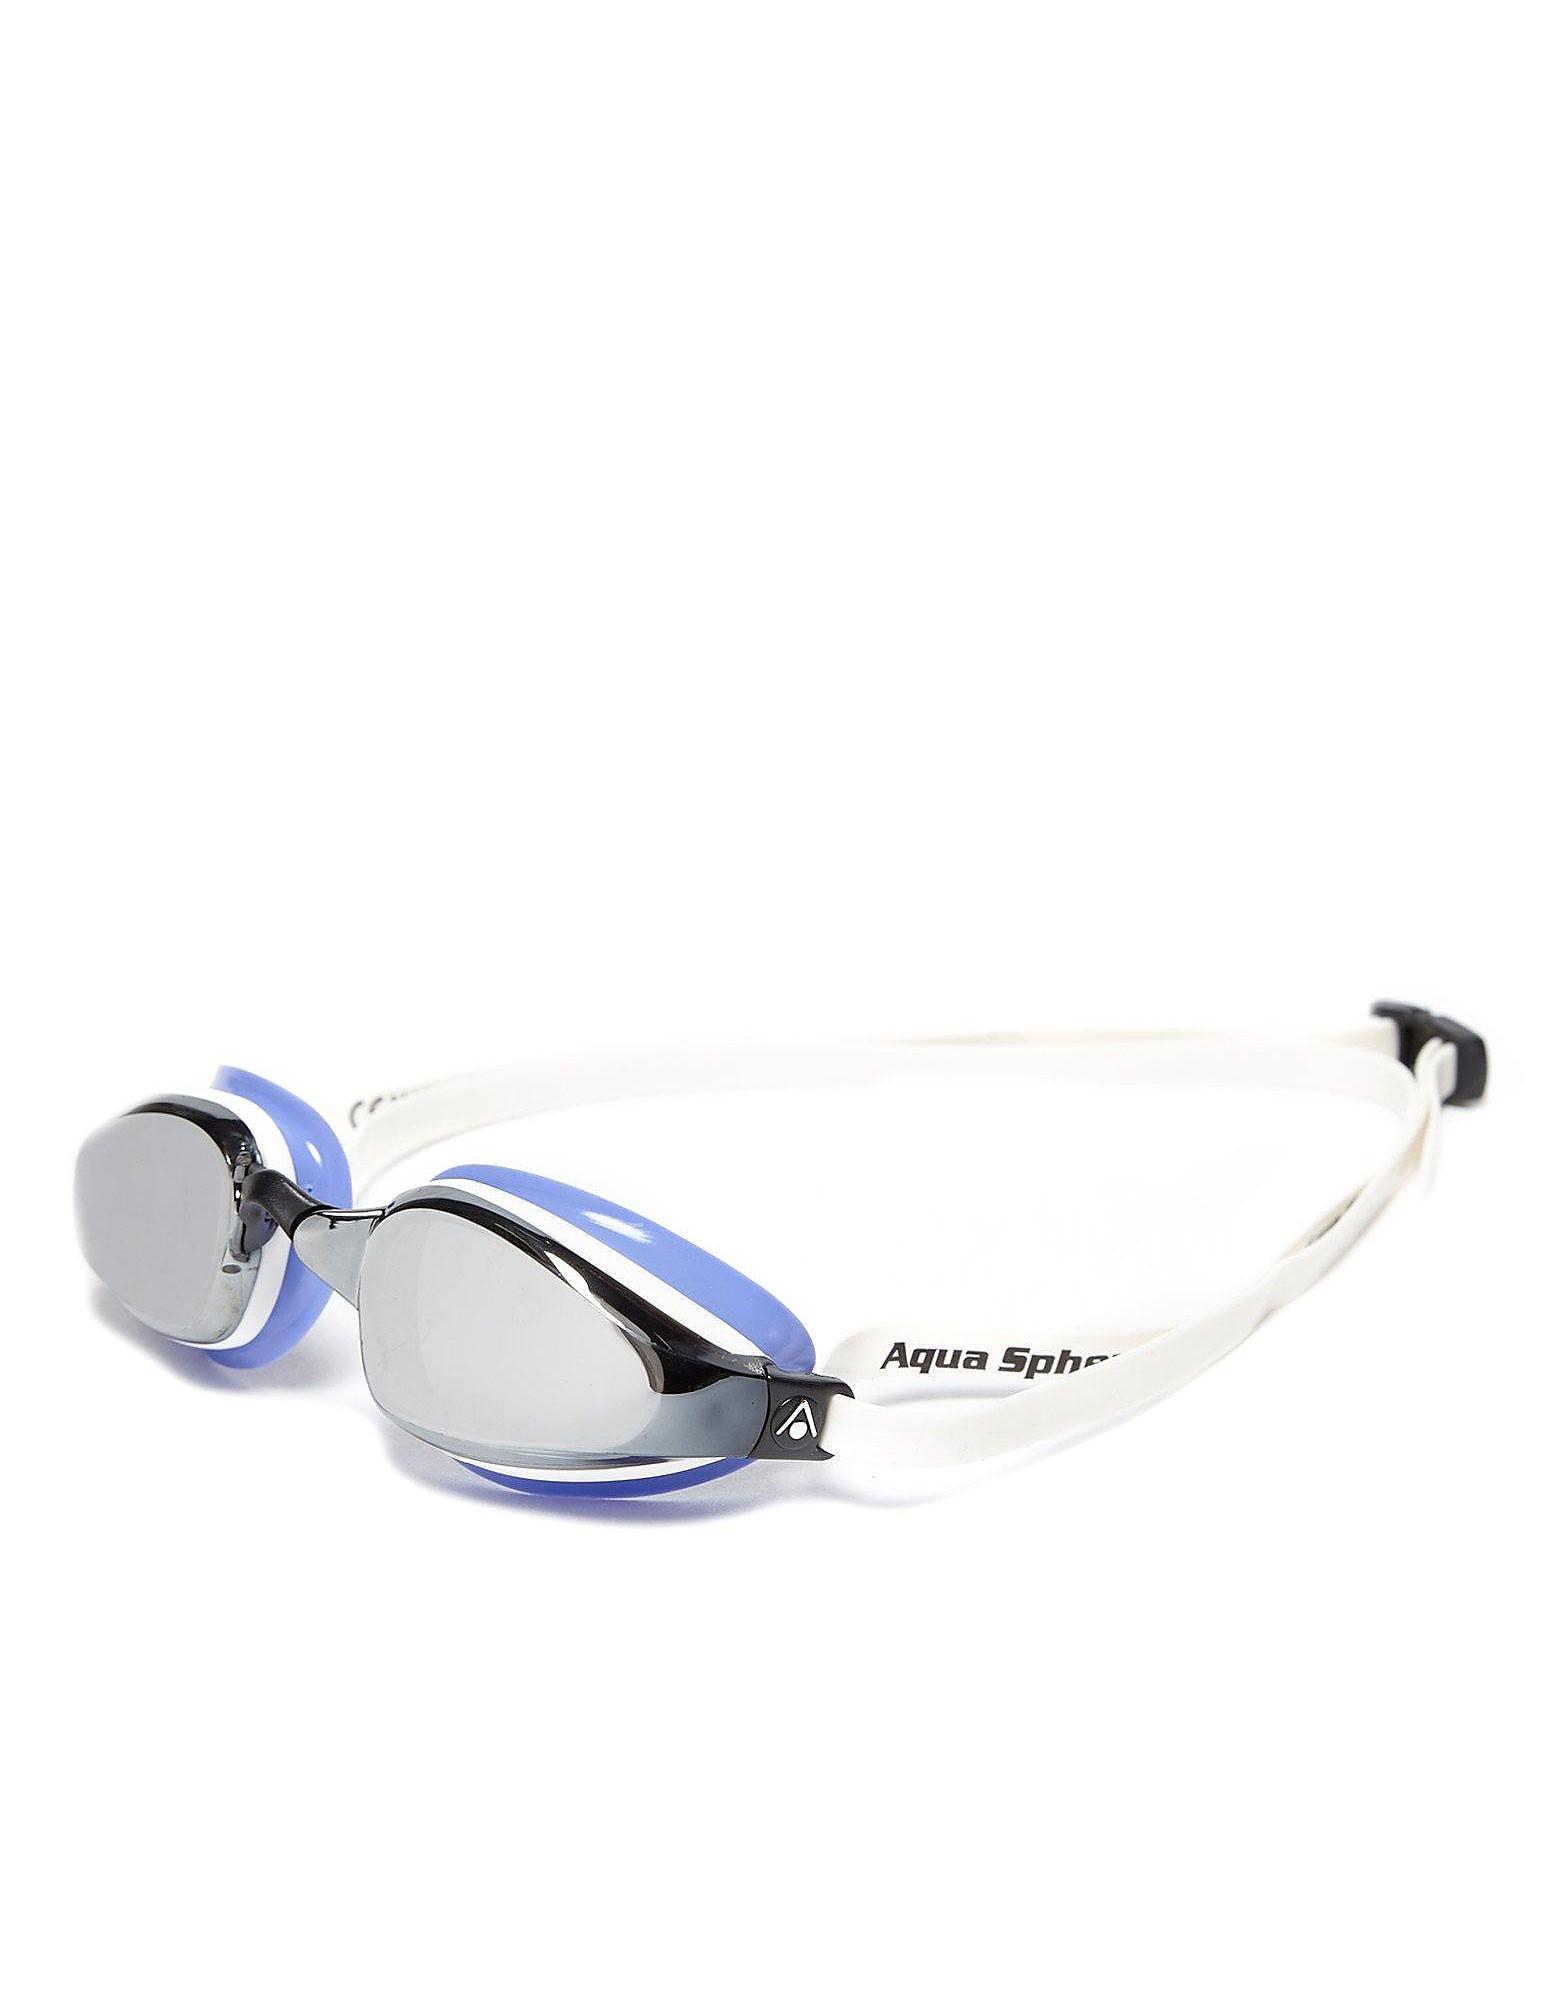 Aqua Sphere K180 Goggles (Mirrored Lens)